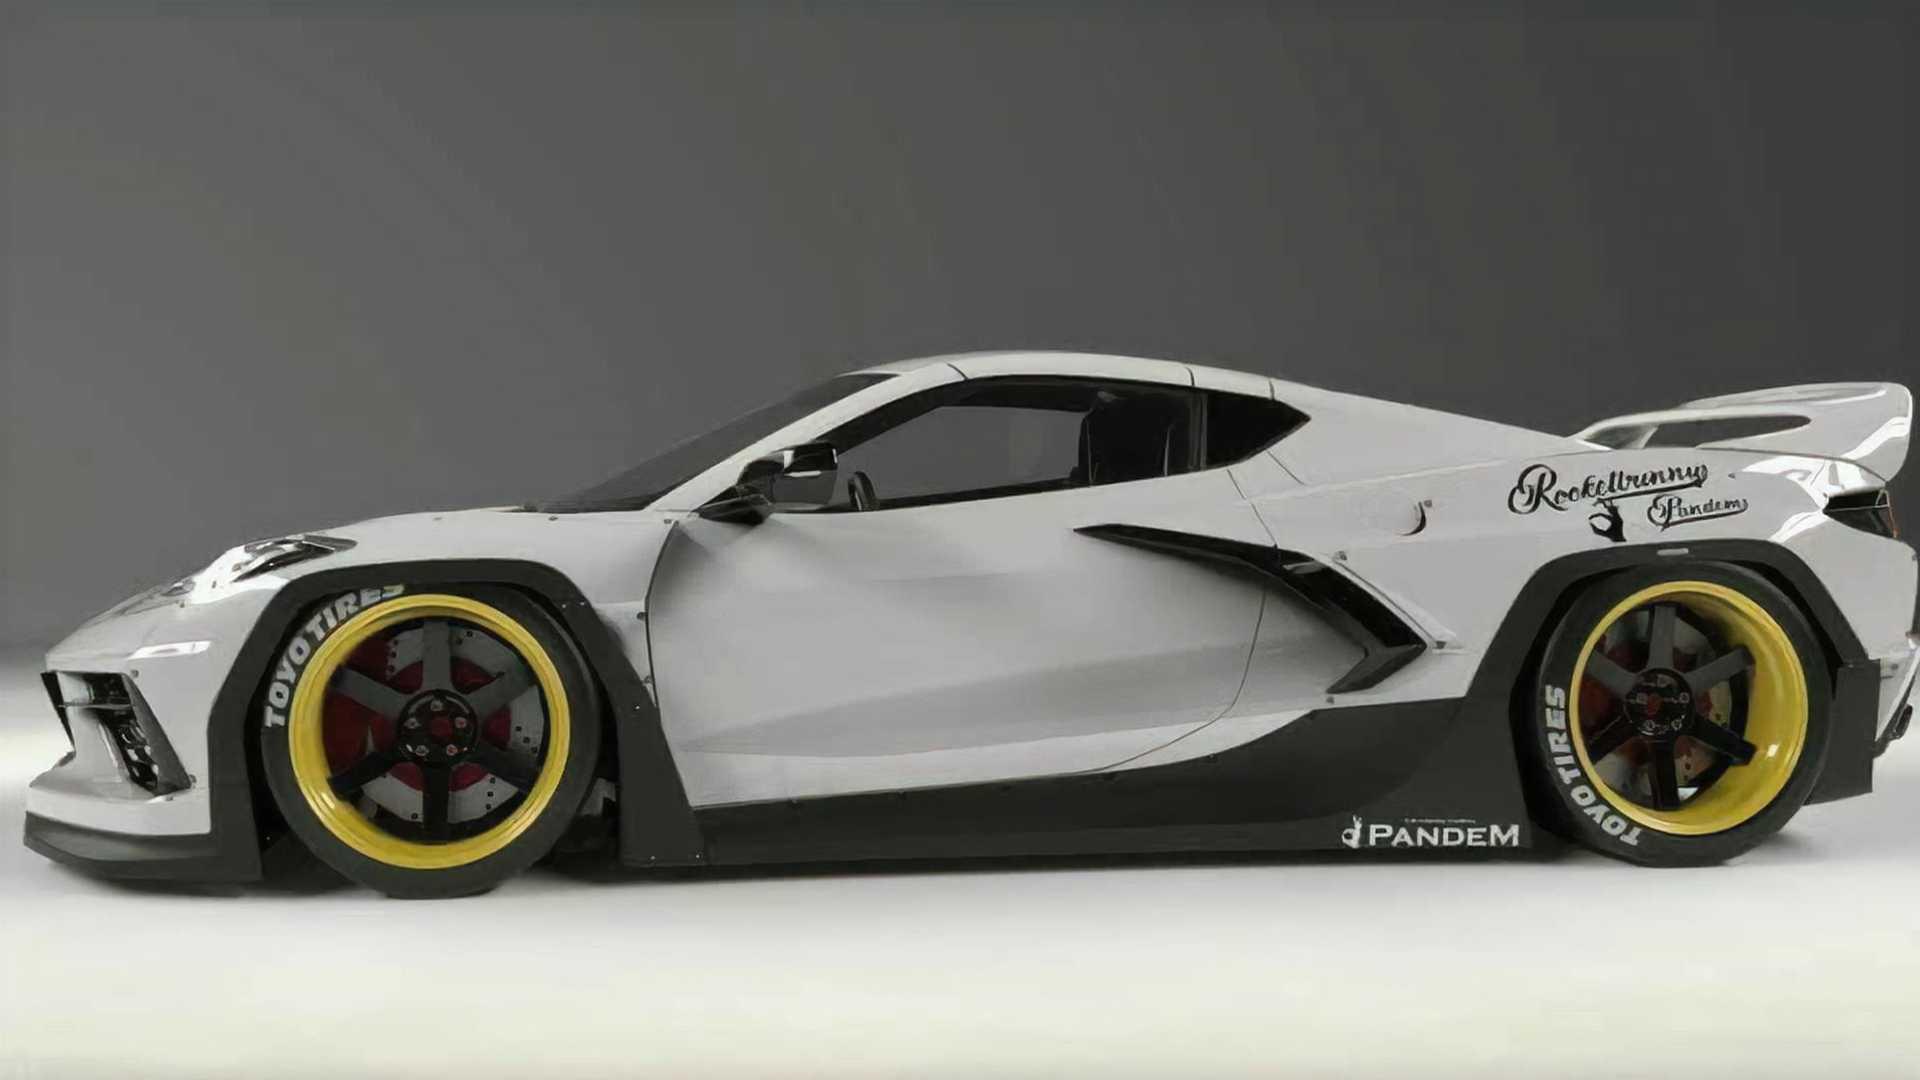 Chevrolet-Corvette-C8-with-Pandem-Rocket-Bunny-bodykit-3